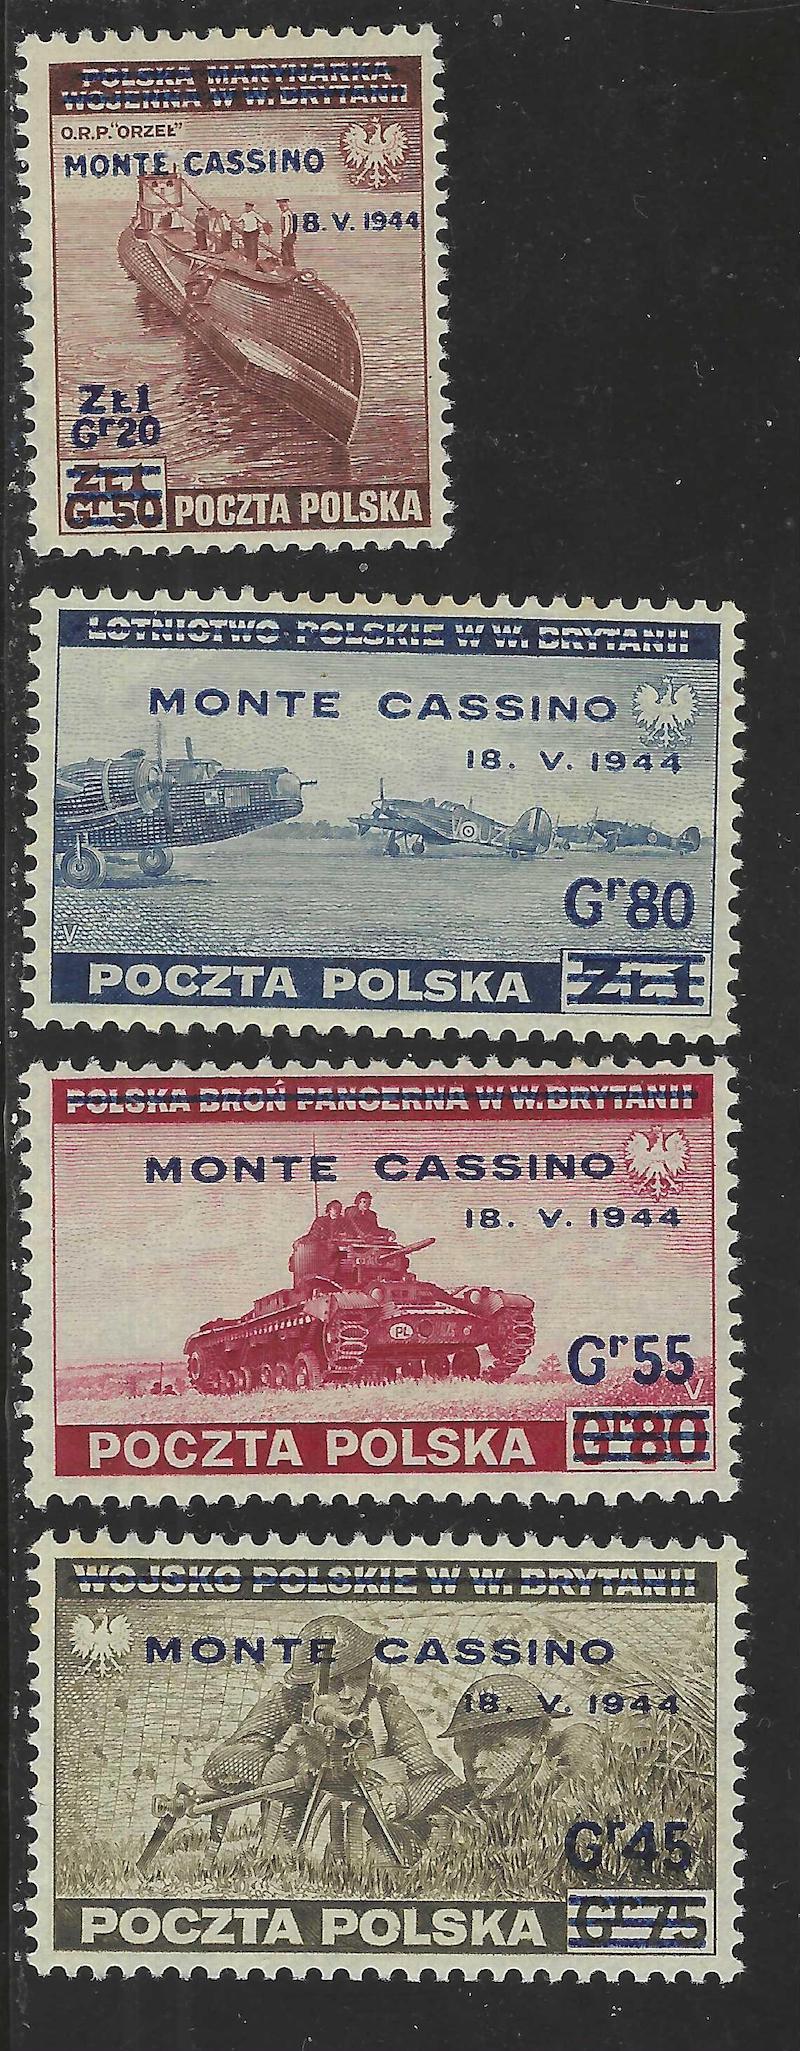 Lot 20 - judaica non JNF labels and stamps -  Negev Holyland 96h Holyland Postal Bid Sale